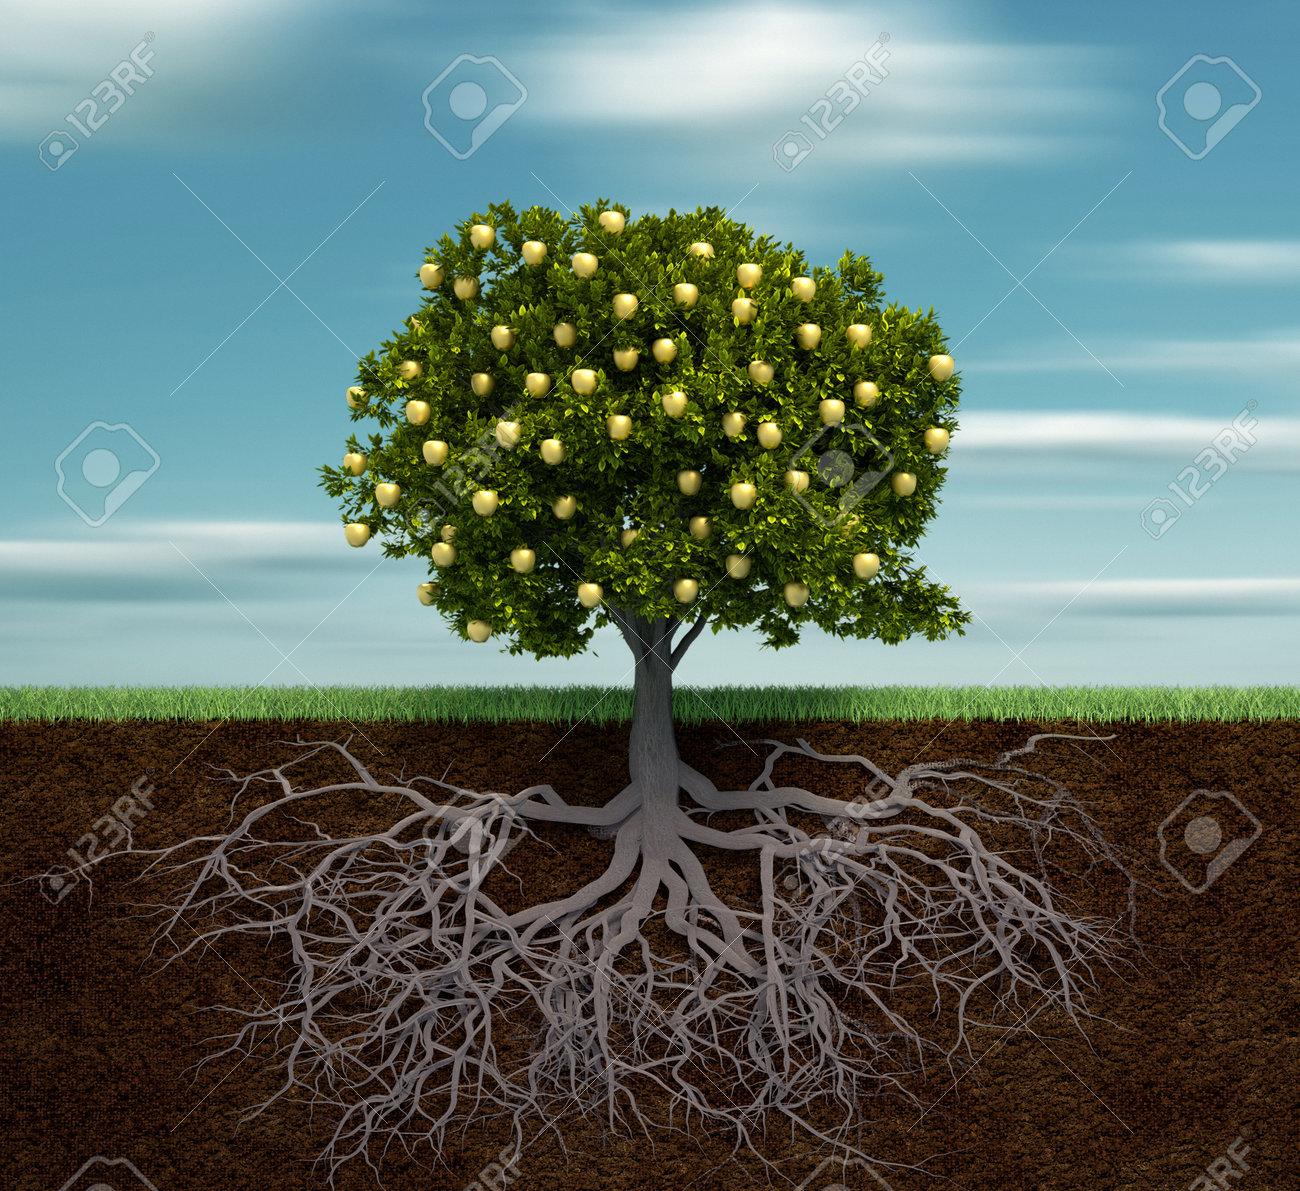 Apple Tree Tree With Golden